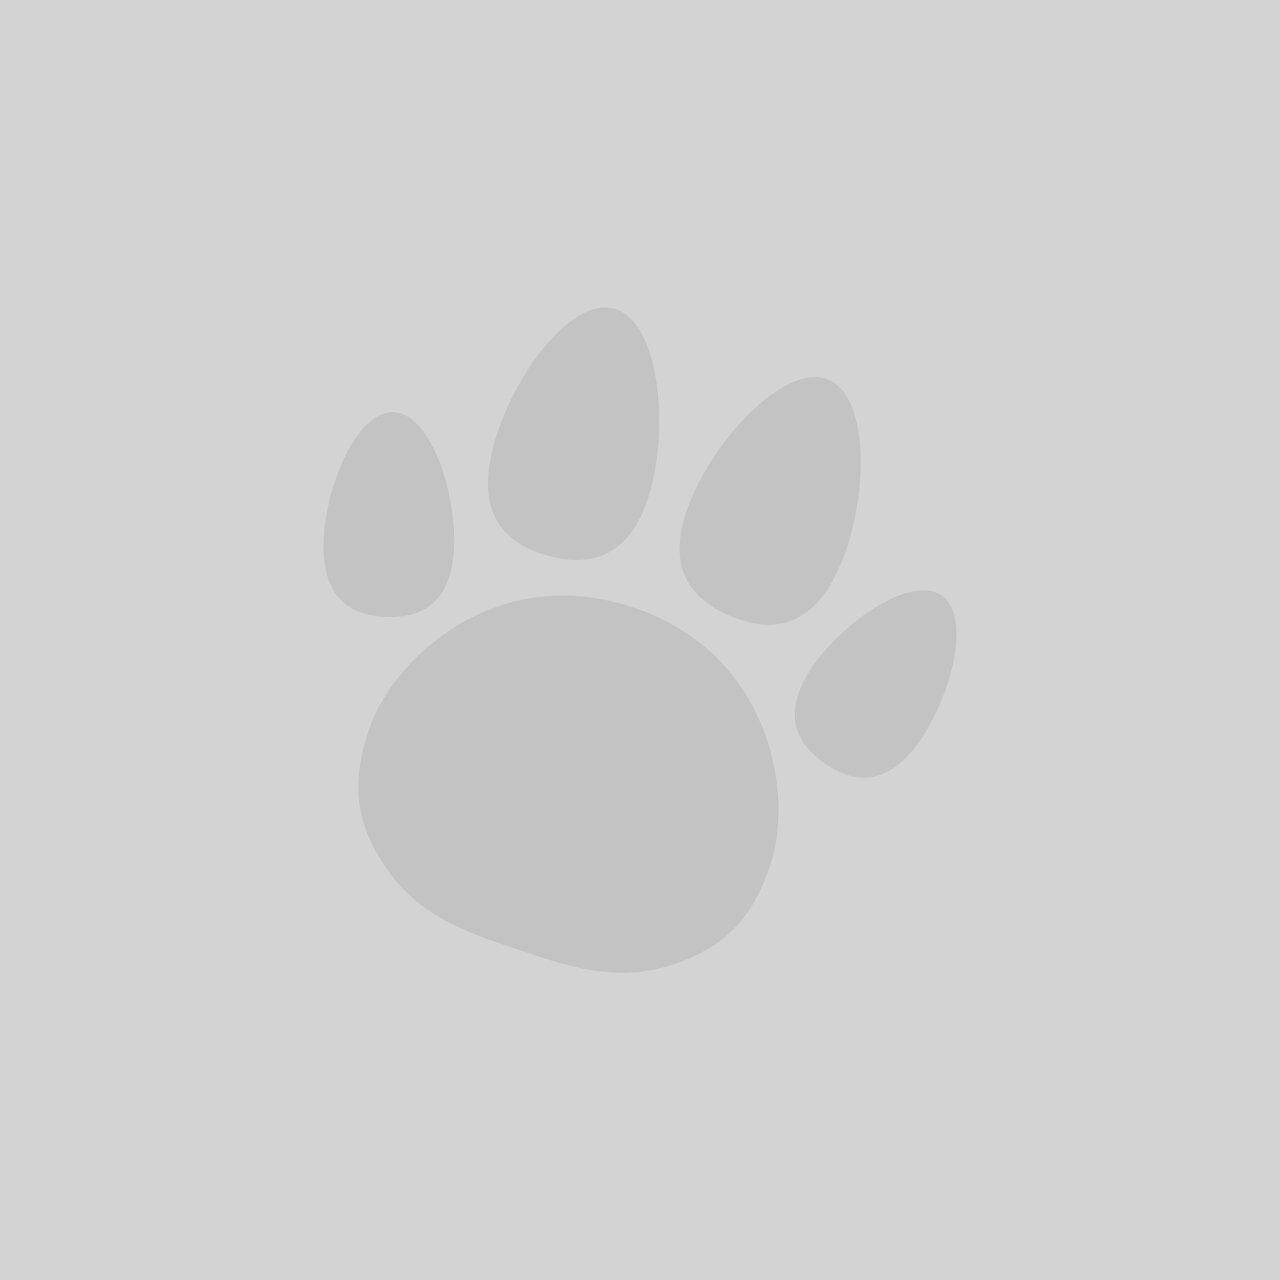 Petface Roller Brush Refill